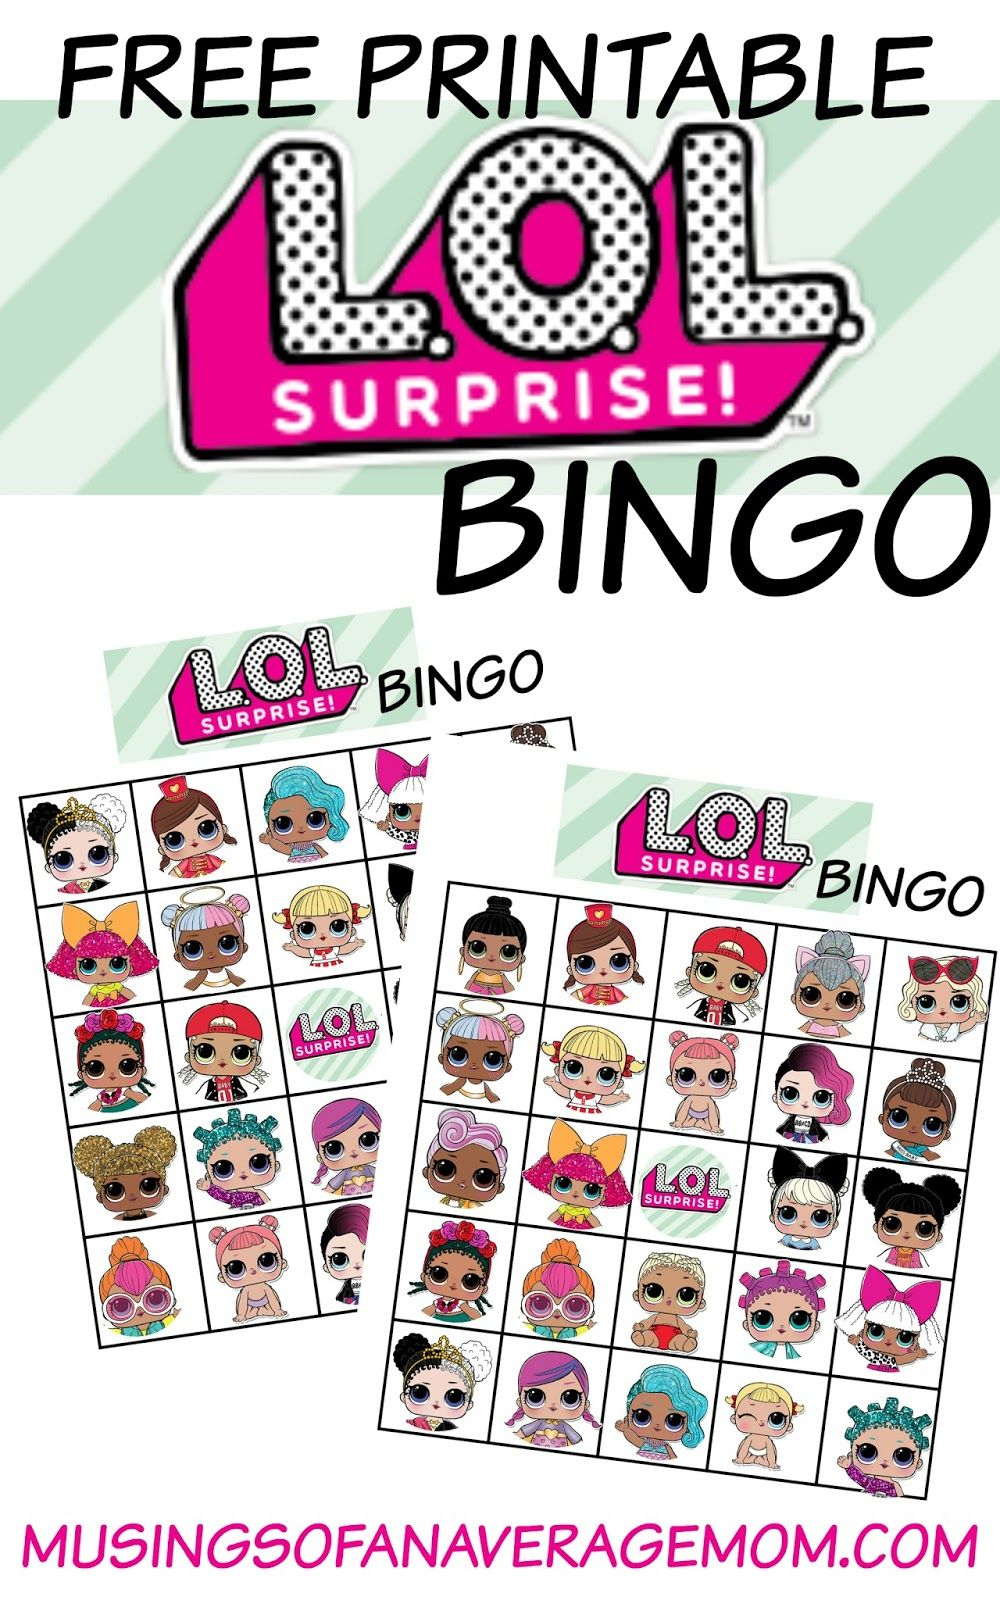 L.O.L. surprise cupcake toppers 2 | Party ideas | Pinterest ...